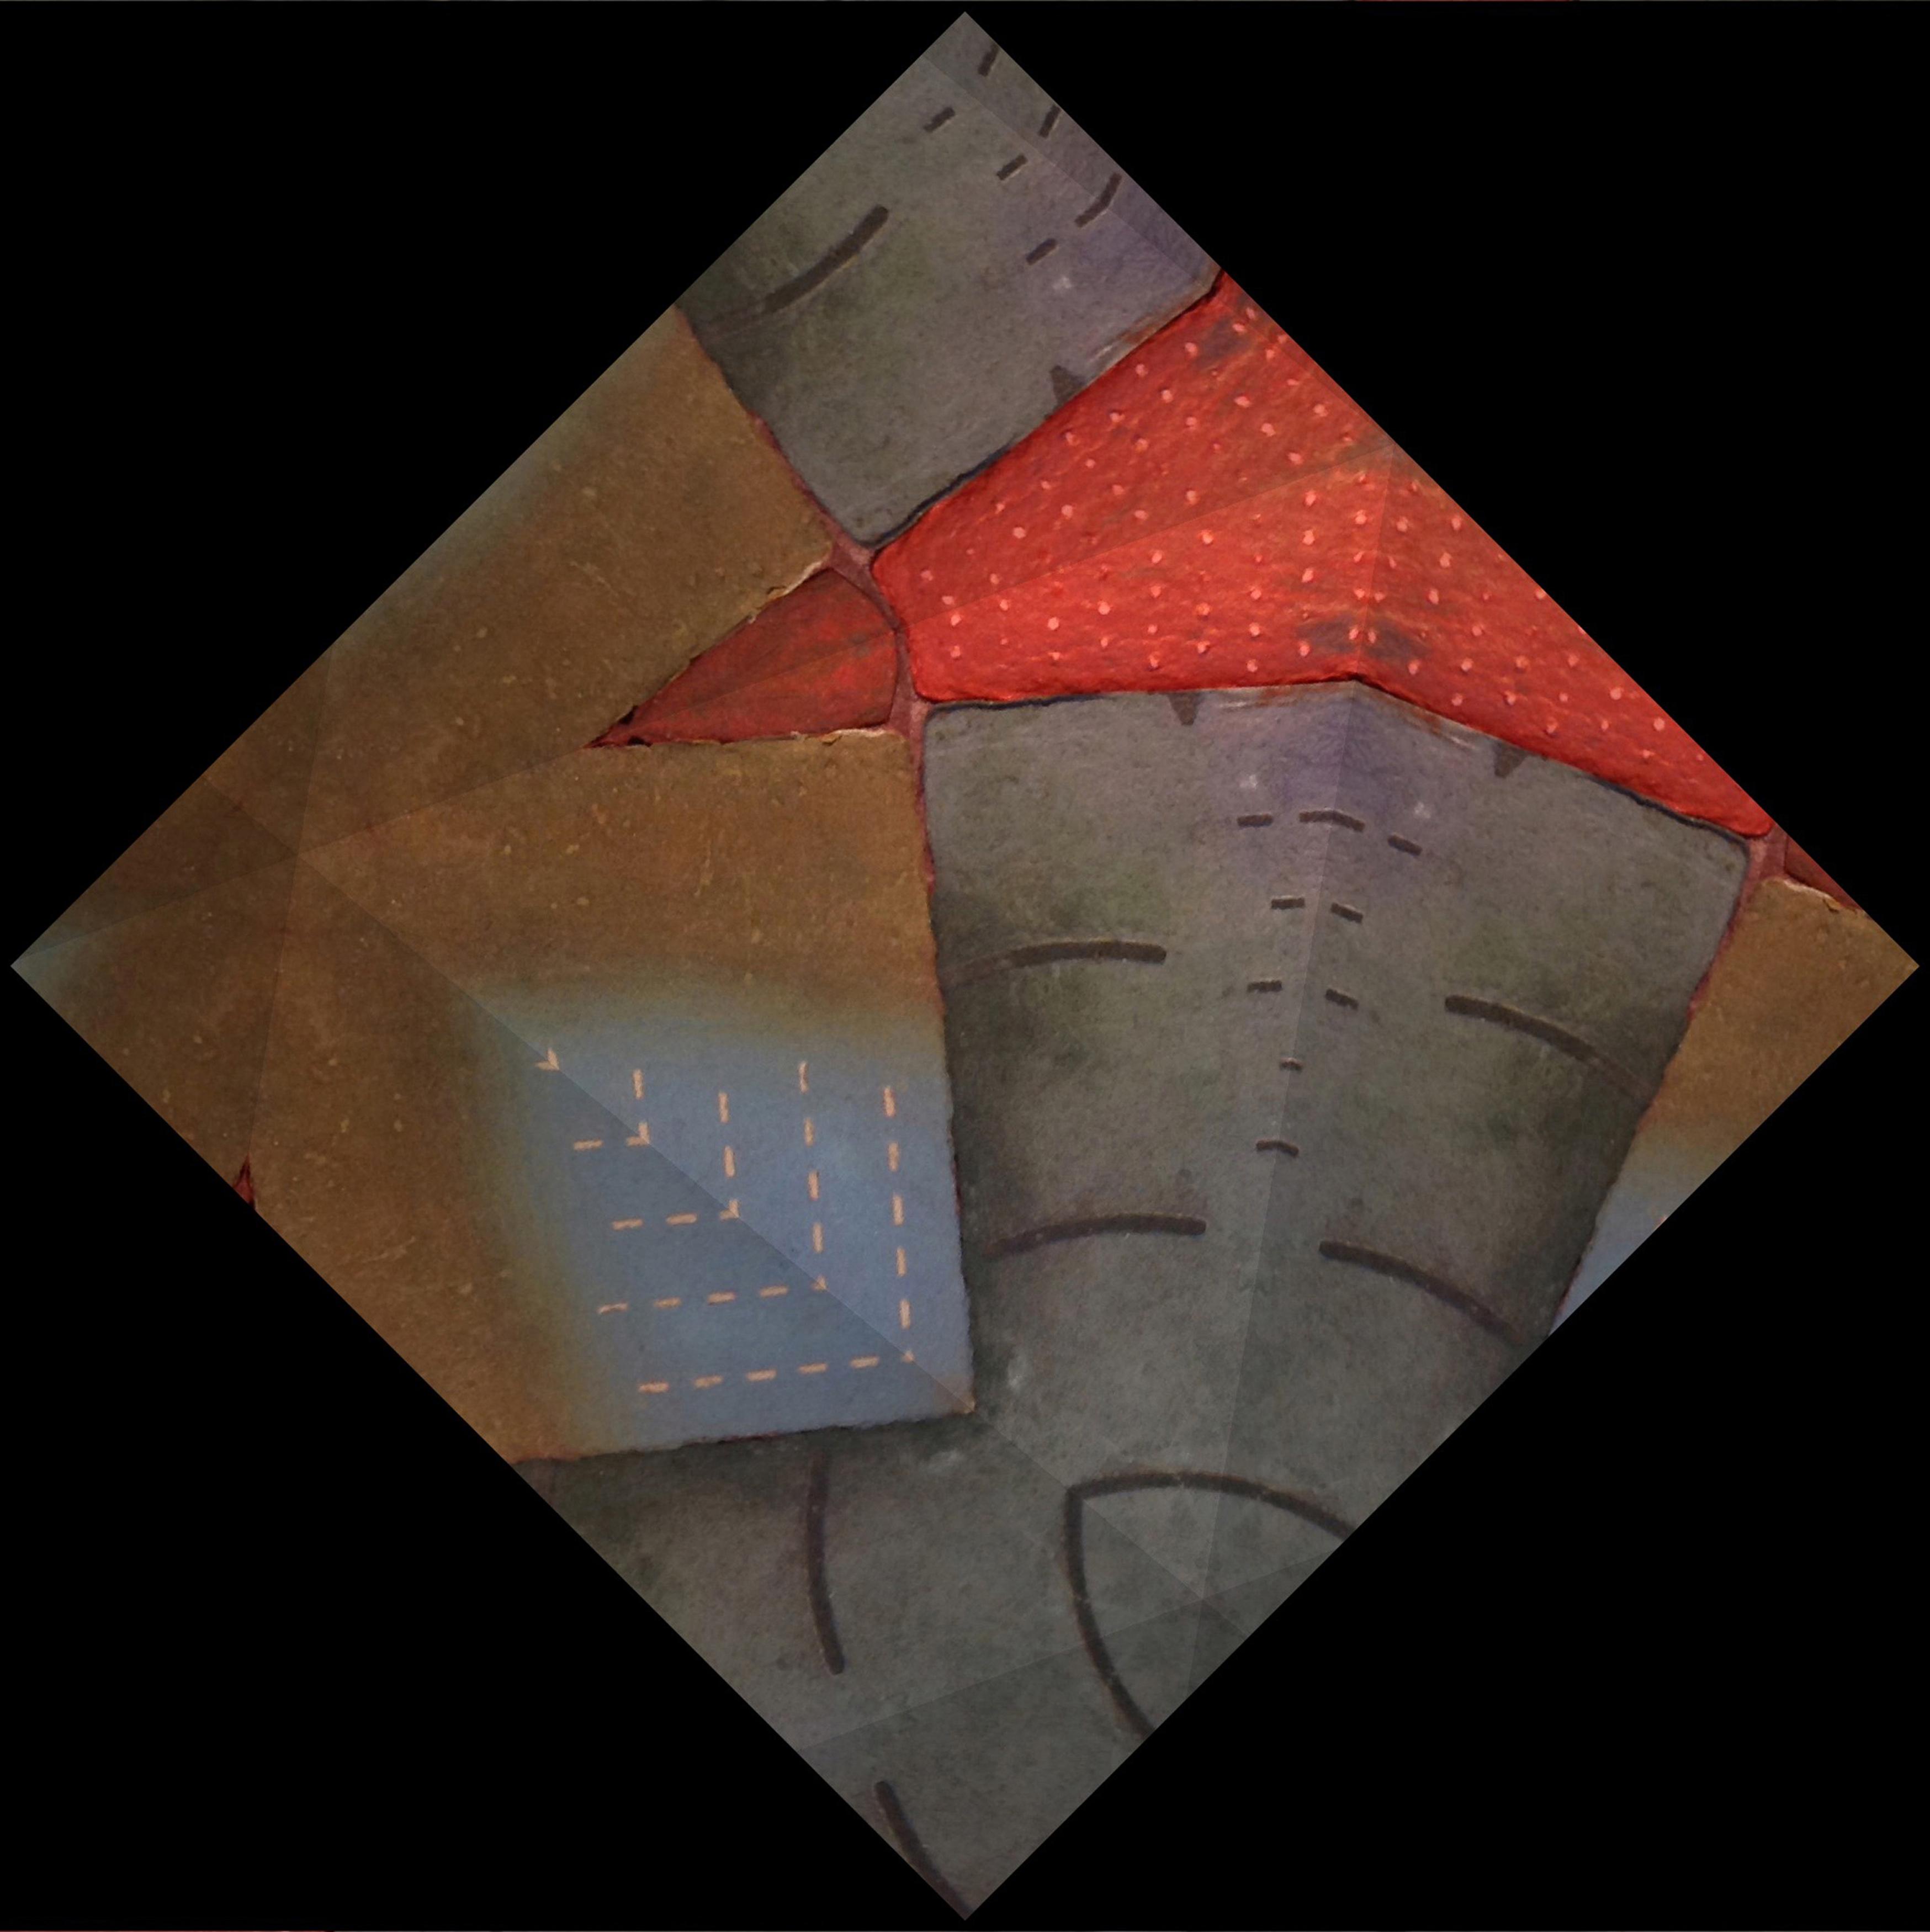 Peter Ford - Diamond Stitch Work     2018  20 x 20 cm archival inkjet print    £100